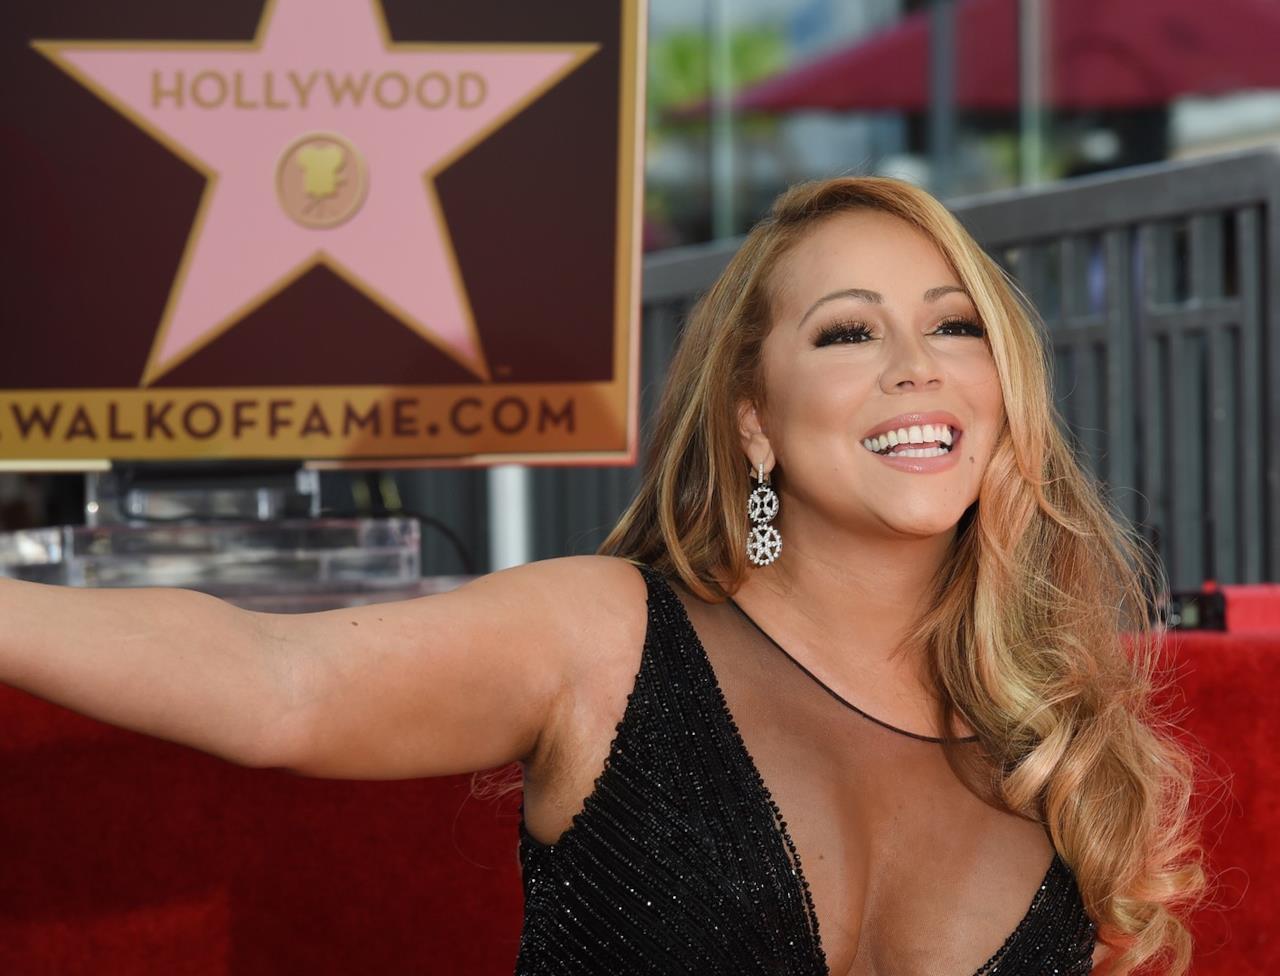 Mariah Carey alla cerimonia sulla Walk of Fame